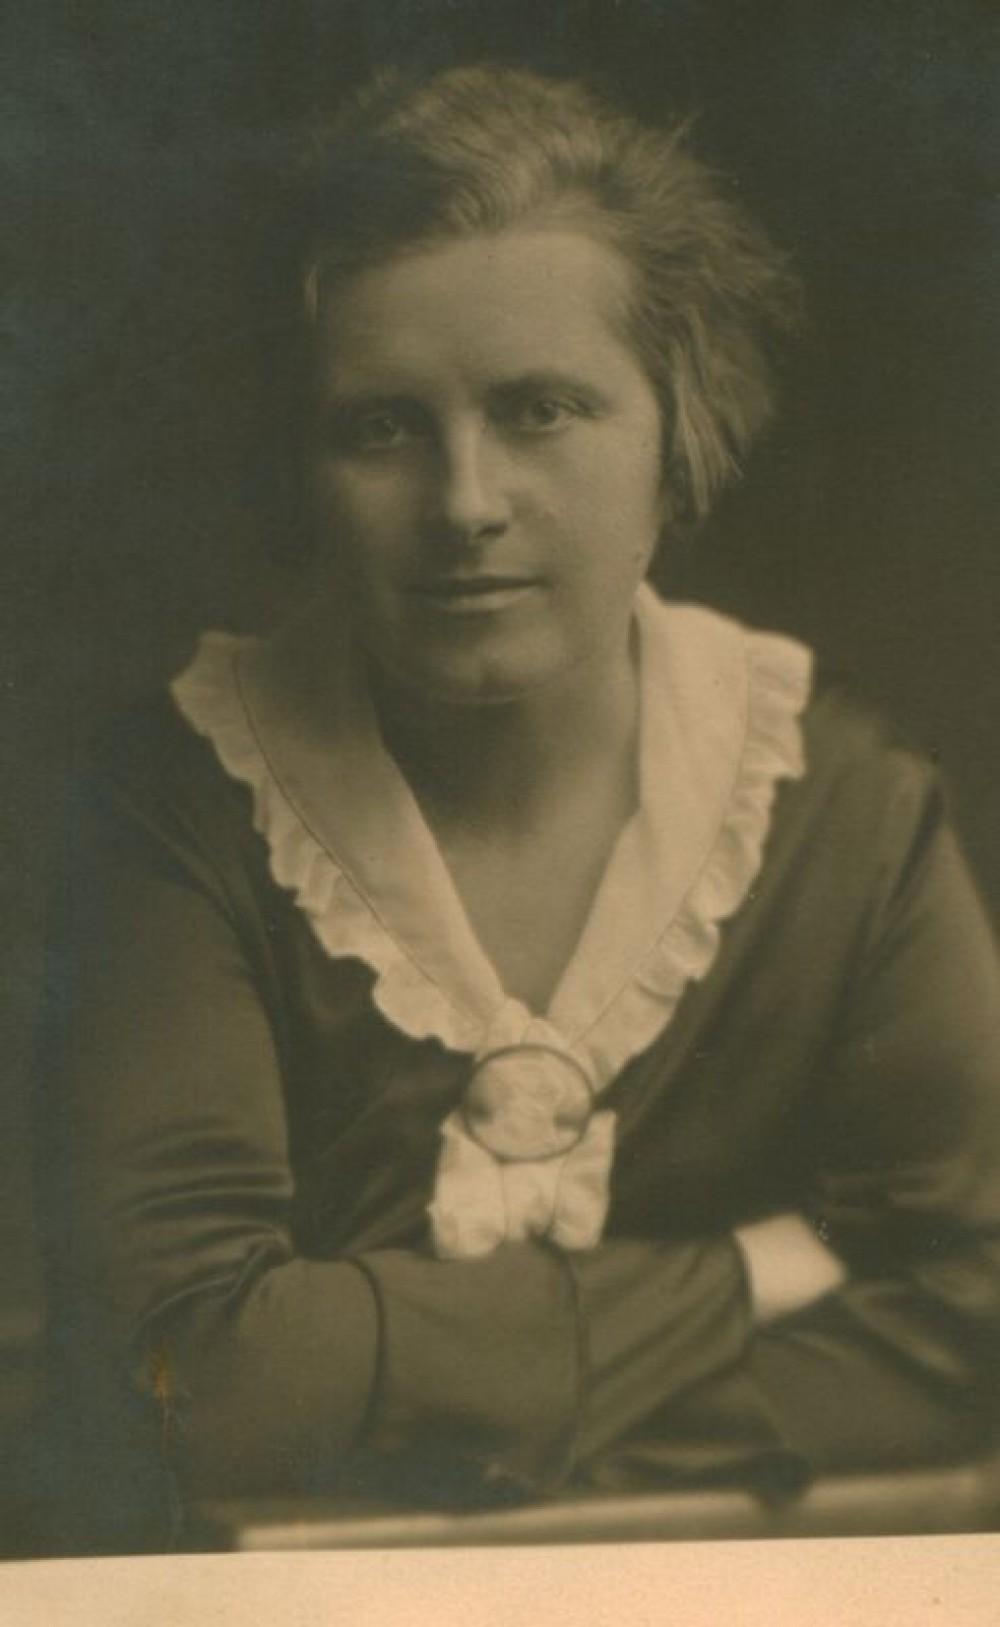 Sofija Čiurlionienė, apie 1928 m.